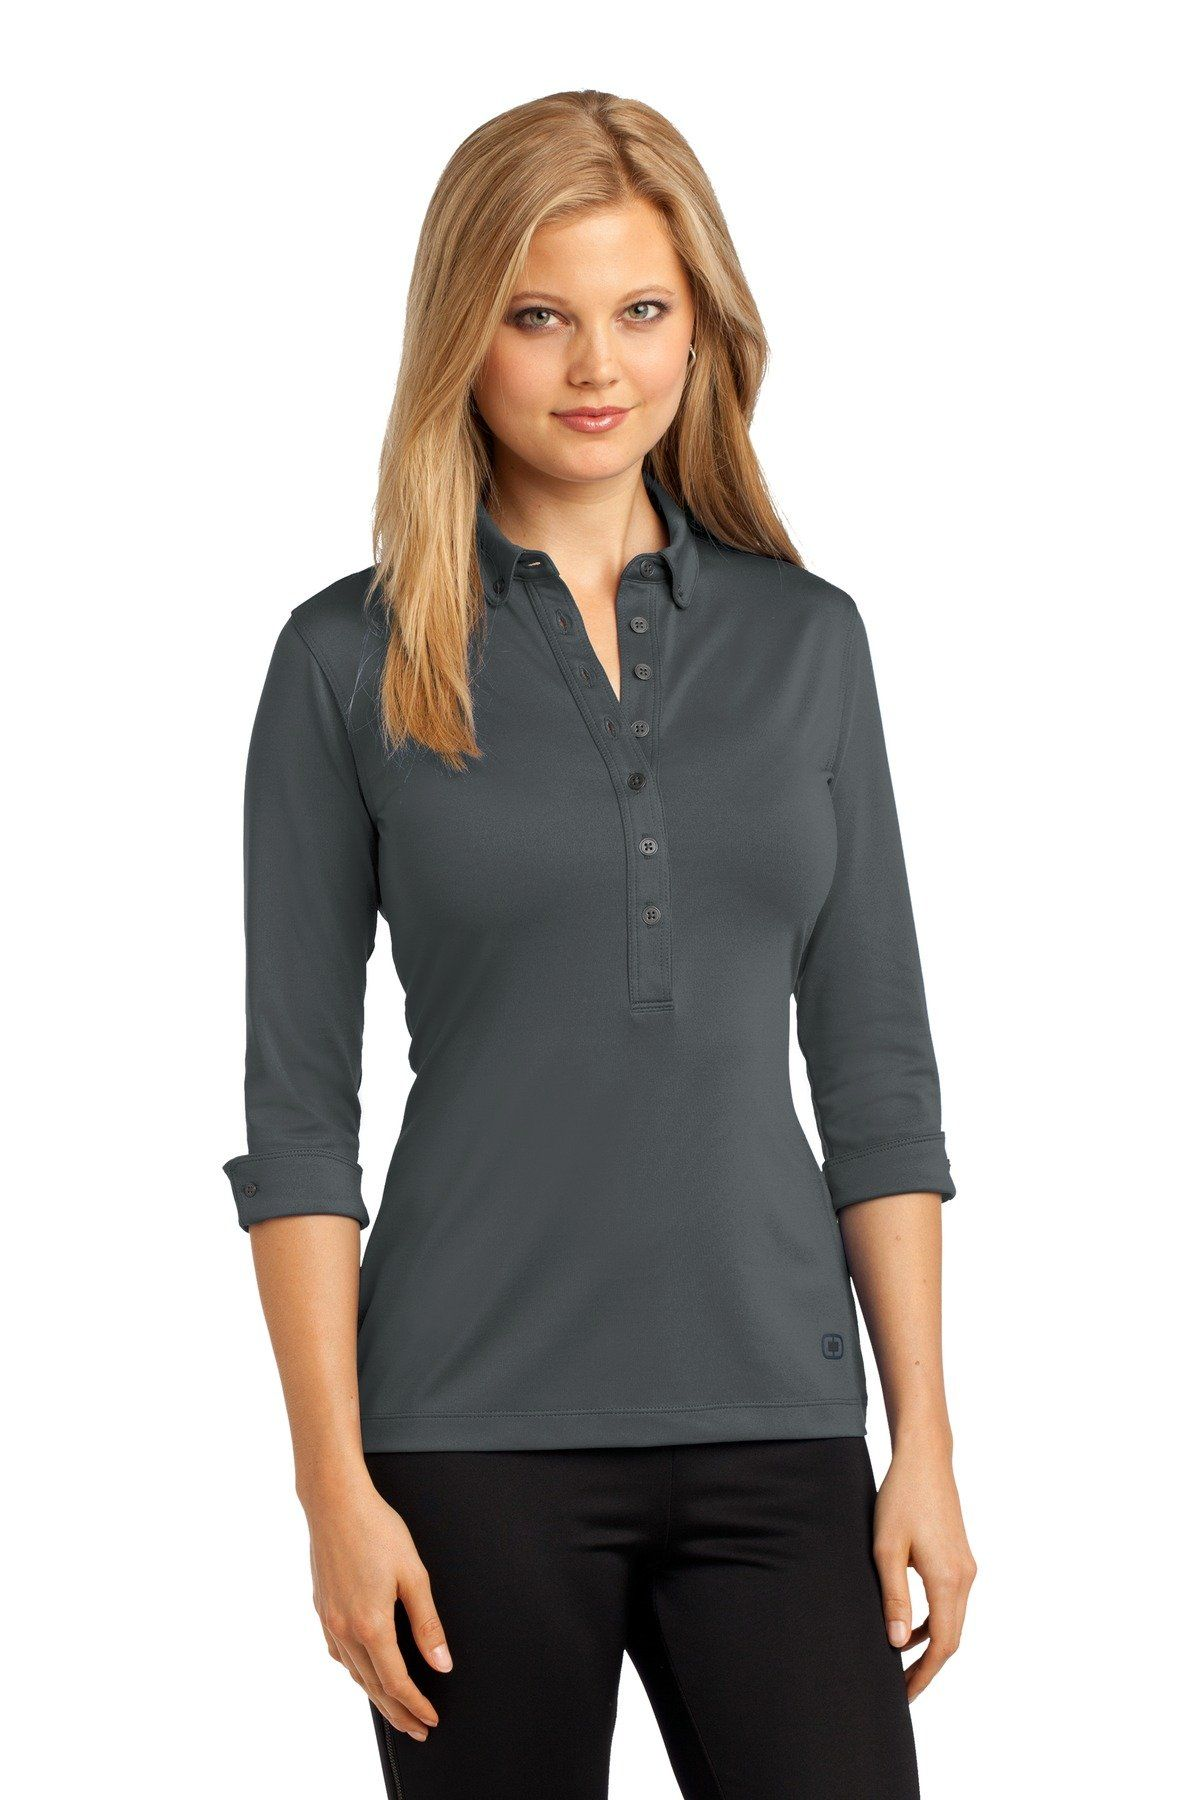 46a33470 Ogio 2.0 Polo Shirts